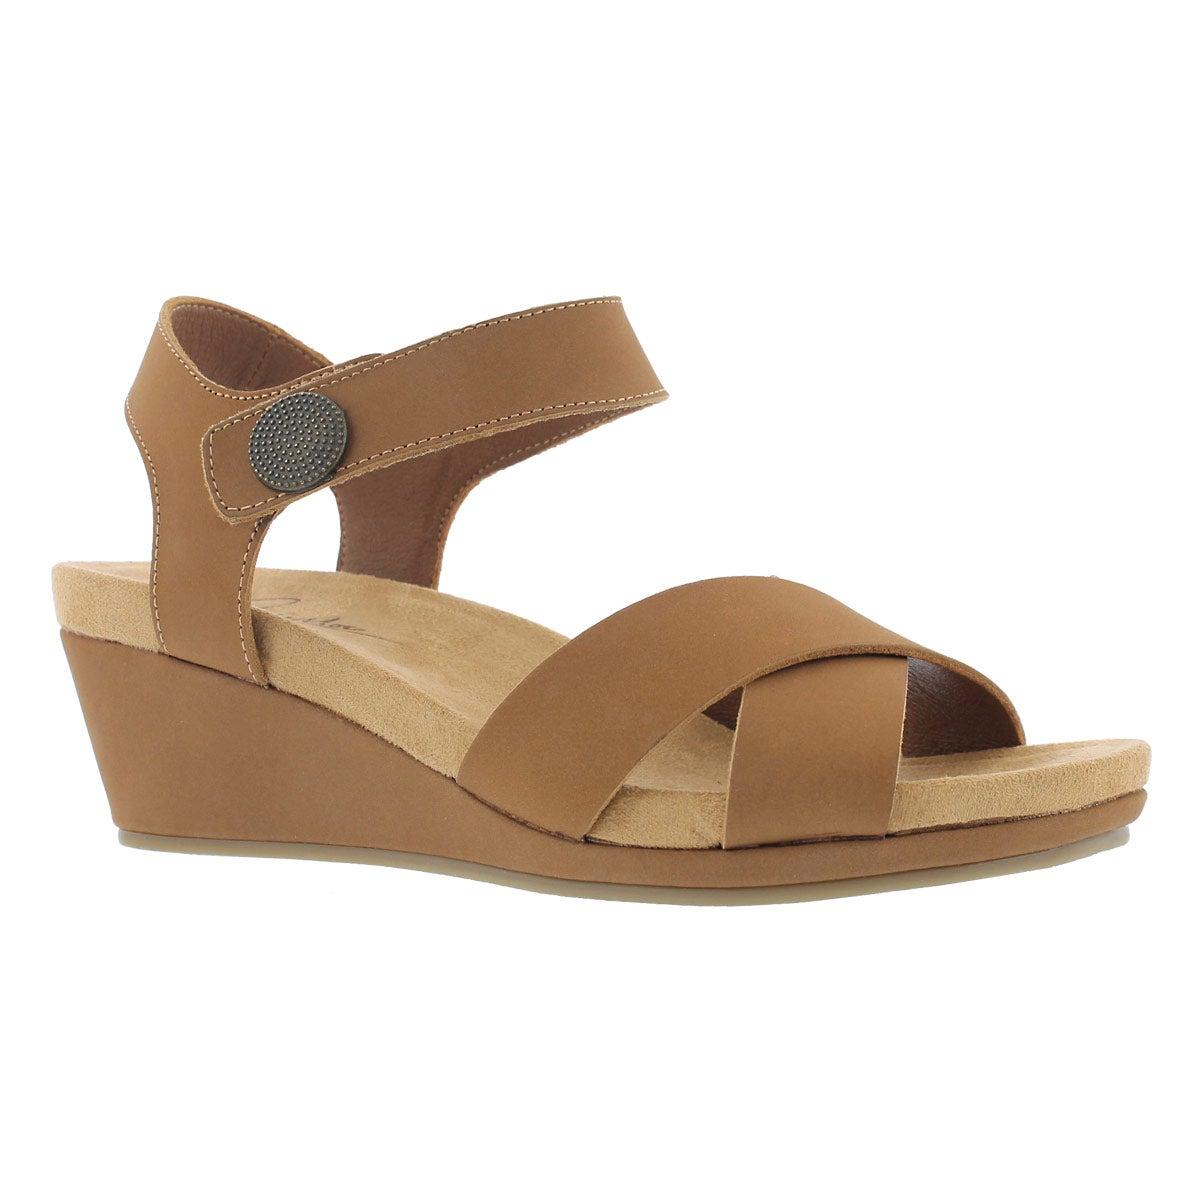 Women's ANNALISA tan casual wedge sandals